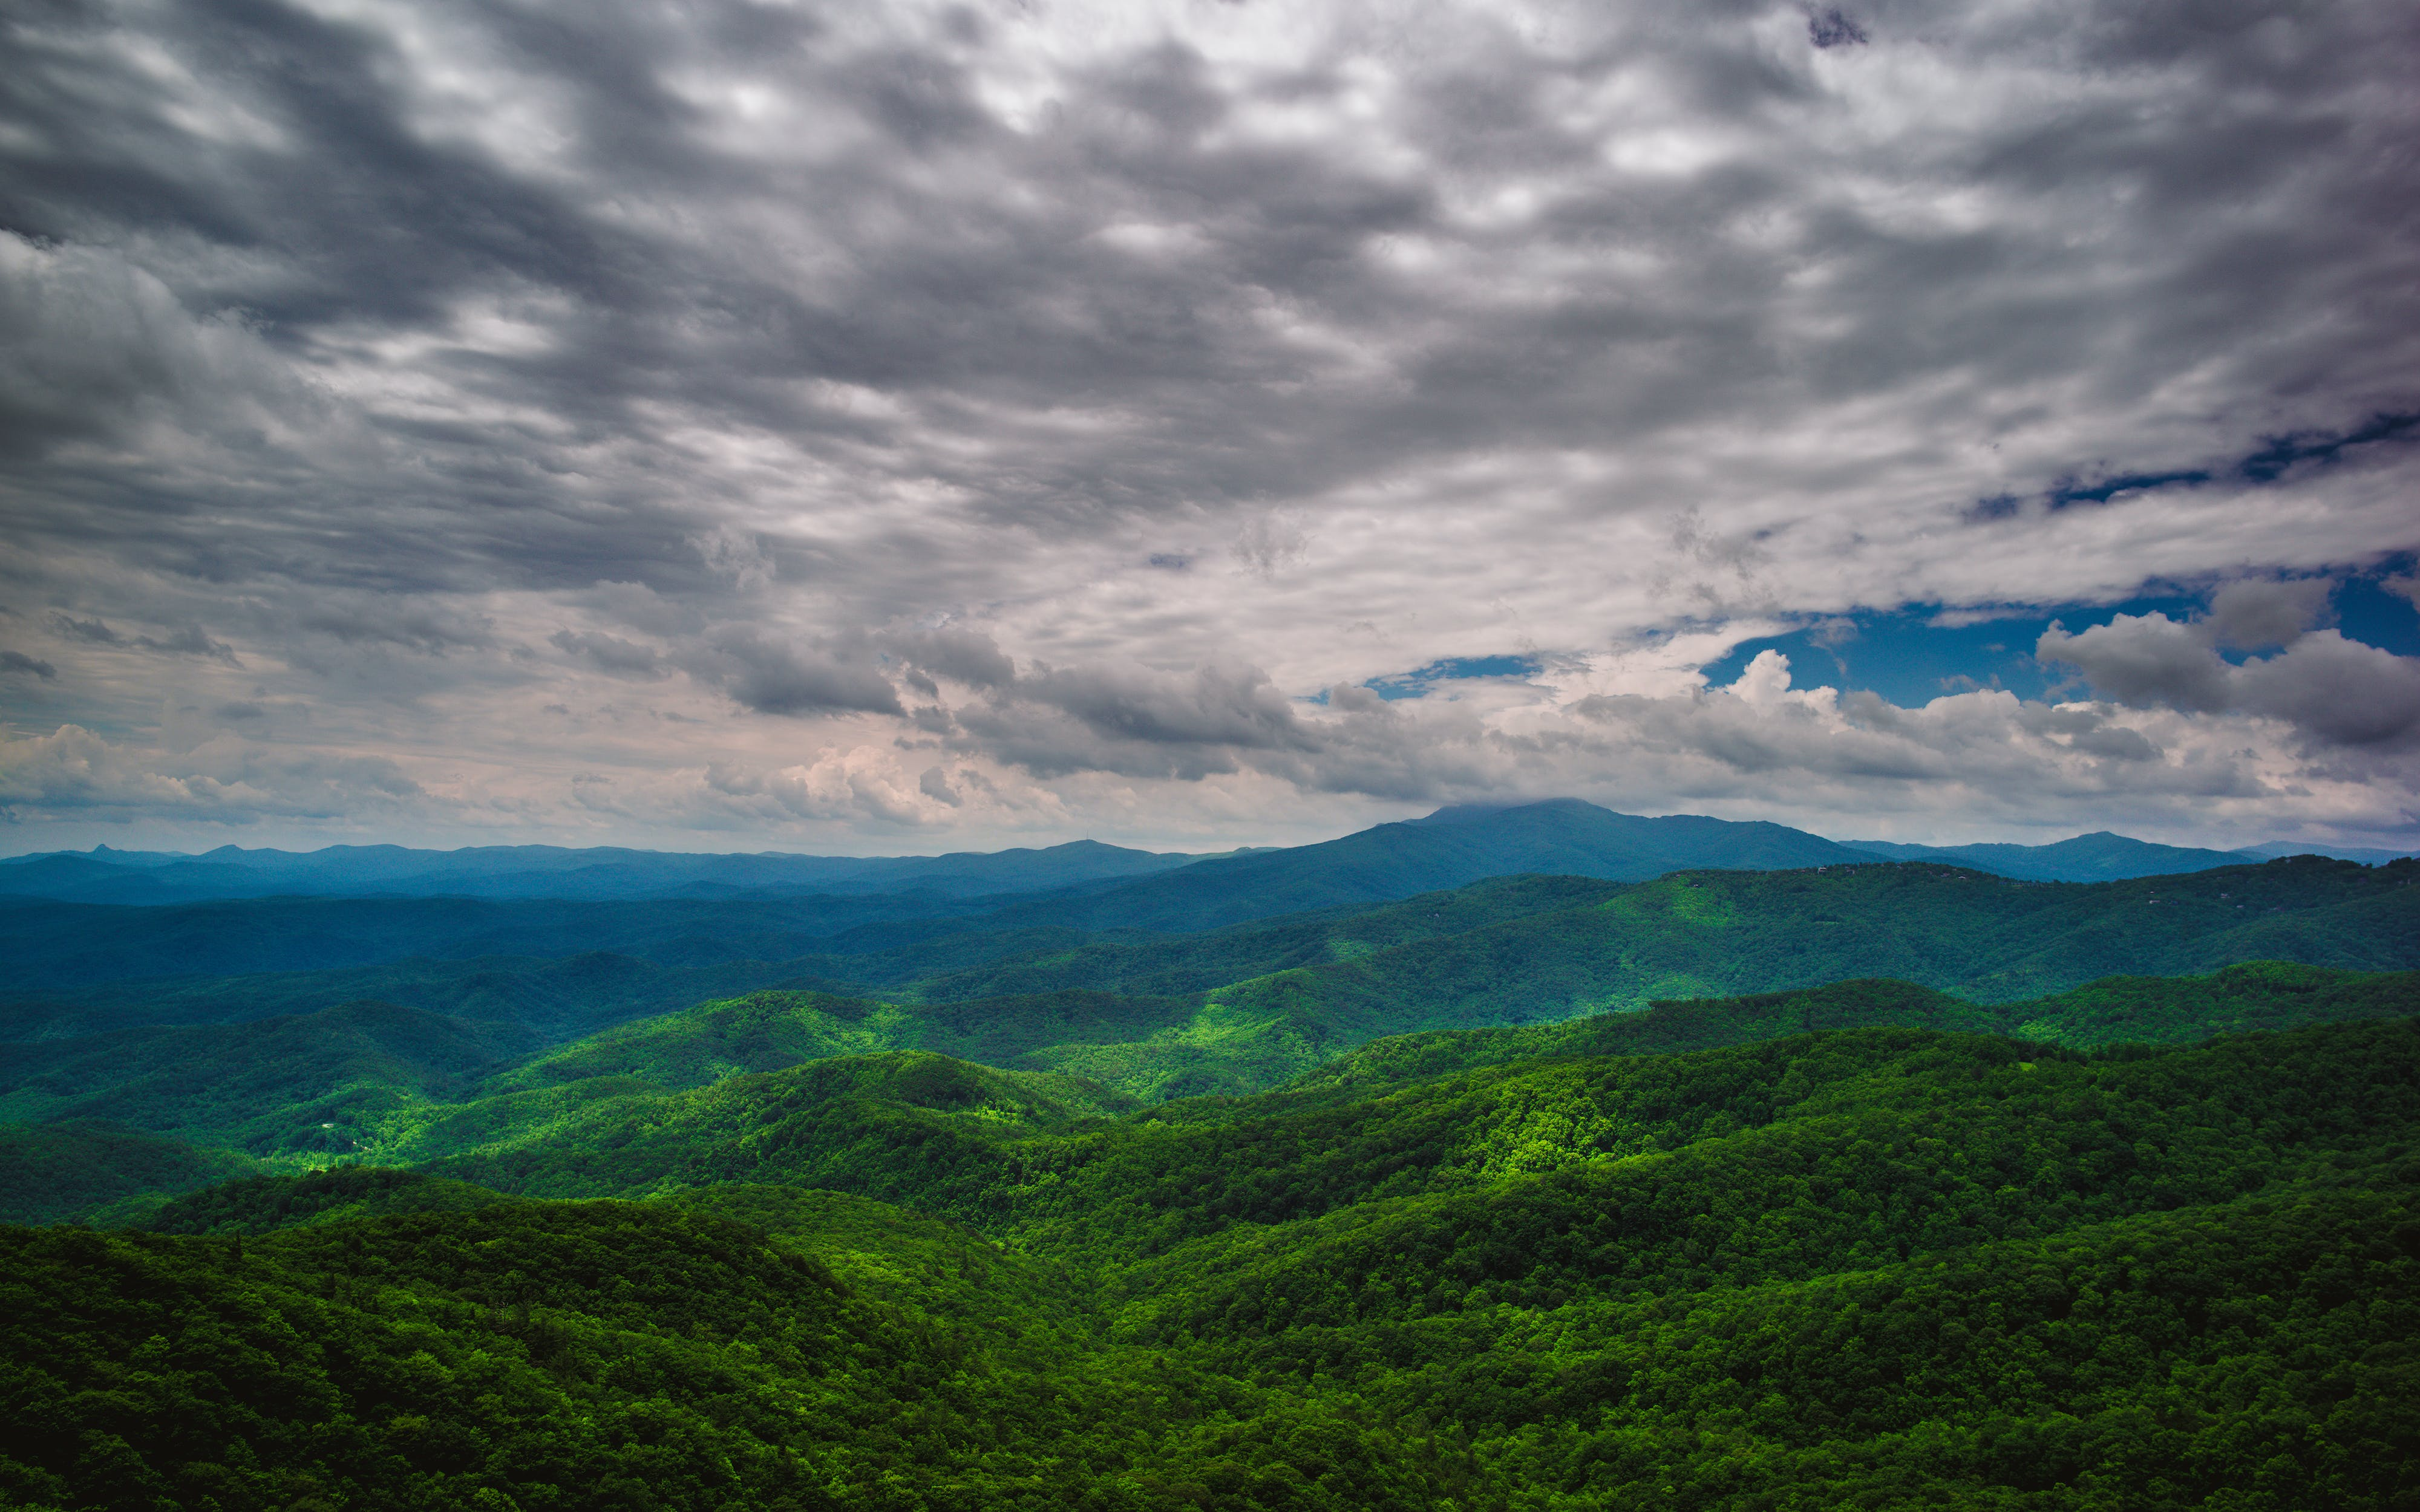 Bird's Eye View Photography of Mountain